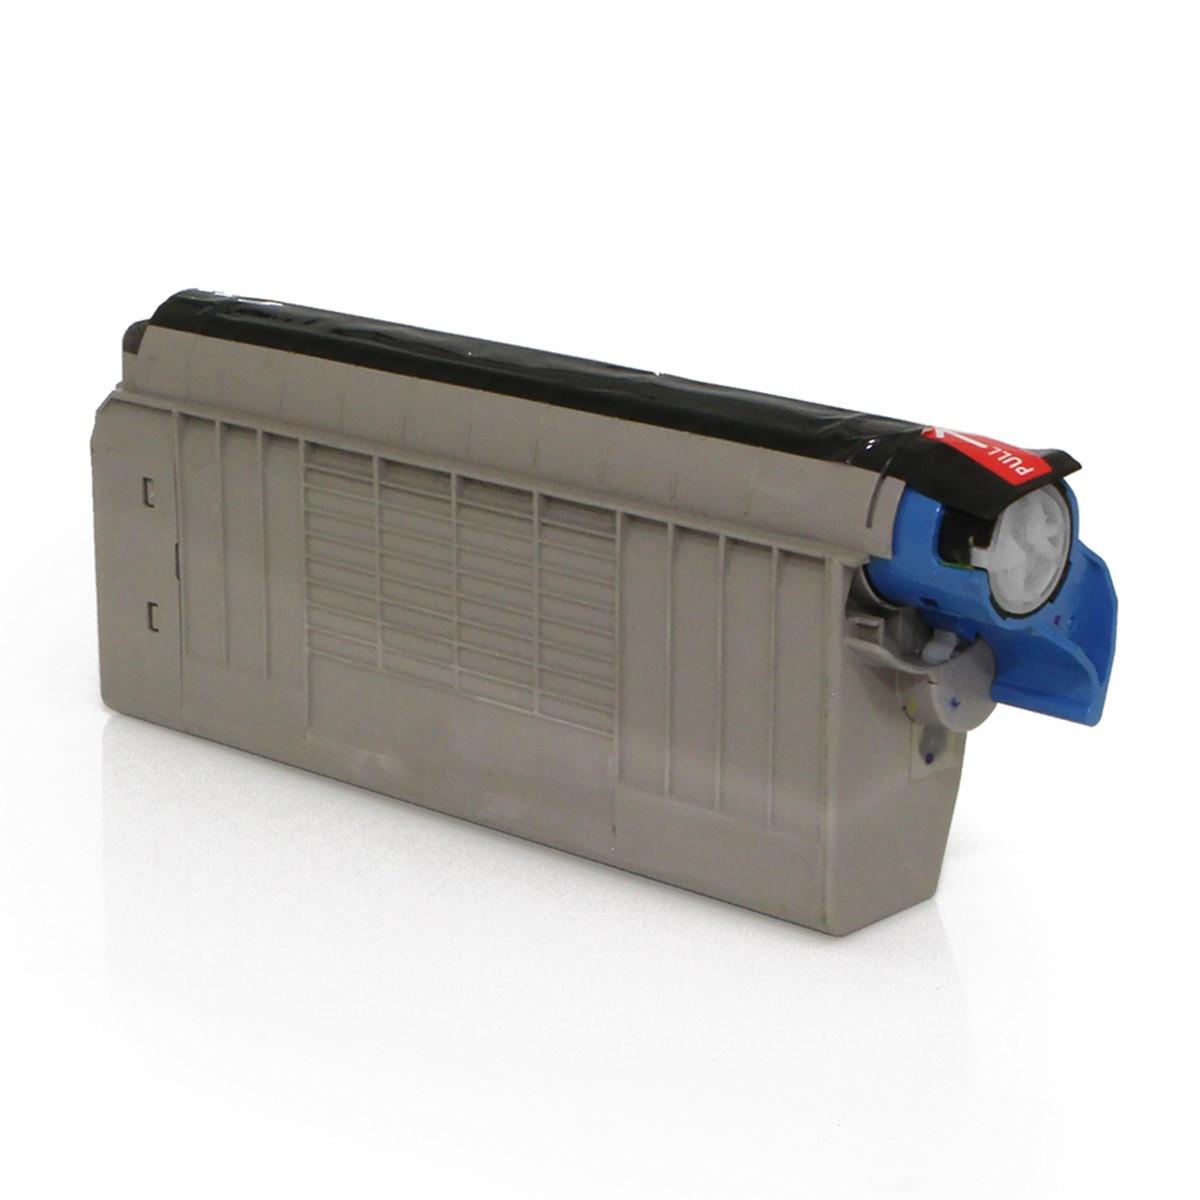 Toner Compatível com Okidata C711 C711N C711WT C710 C710DN Magenta 44318602 | Importado 11.5k